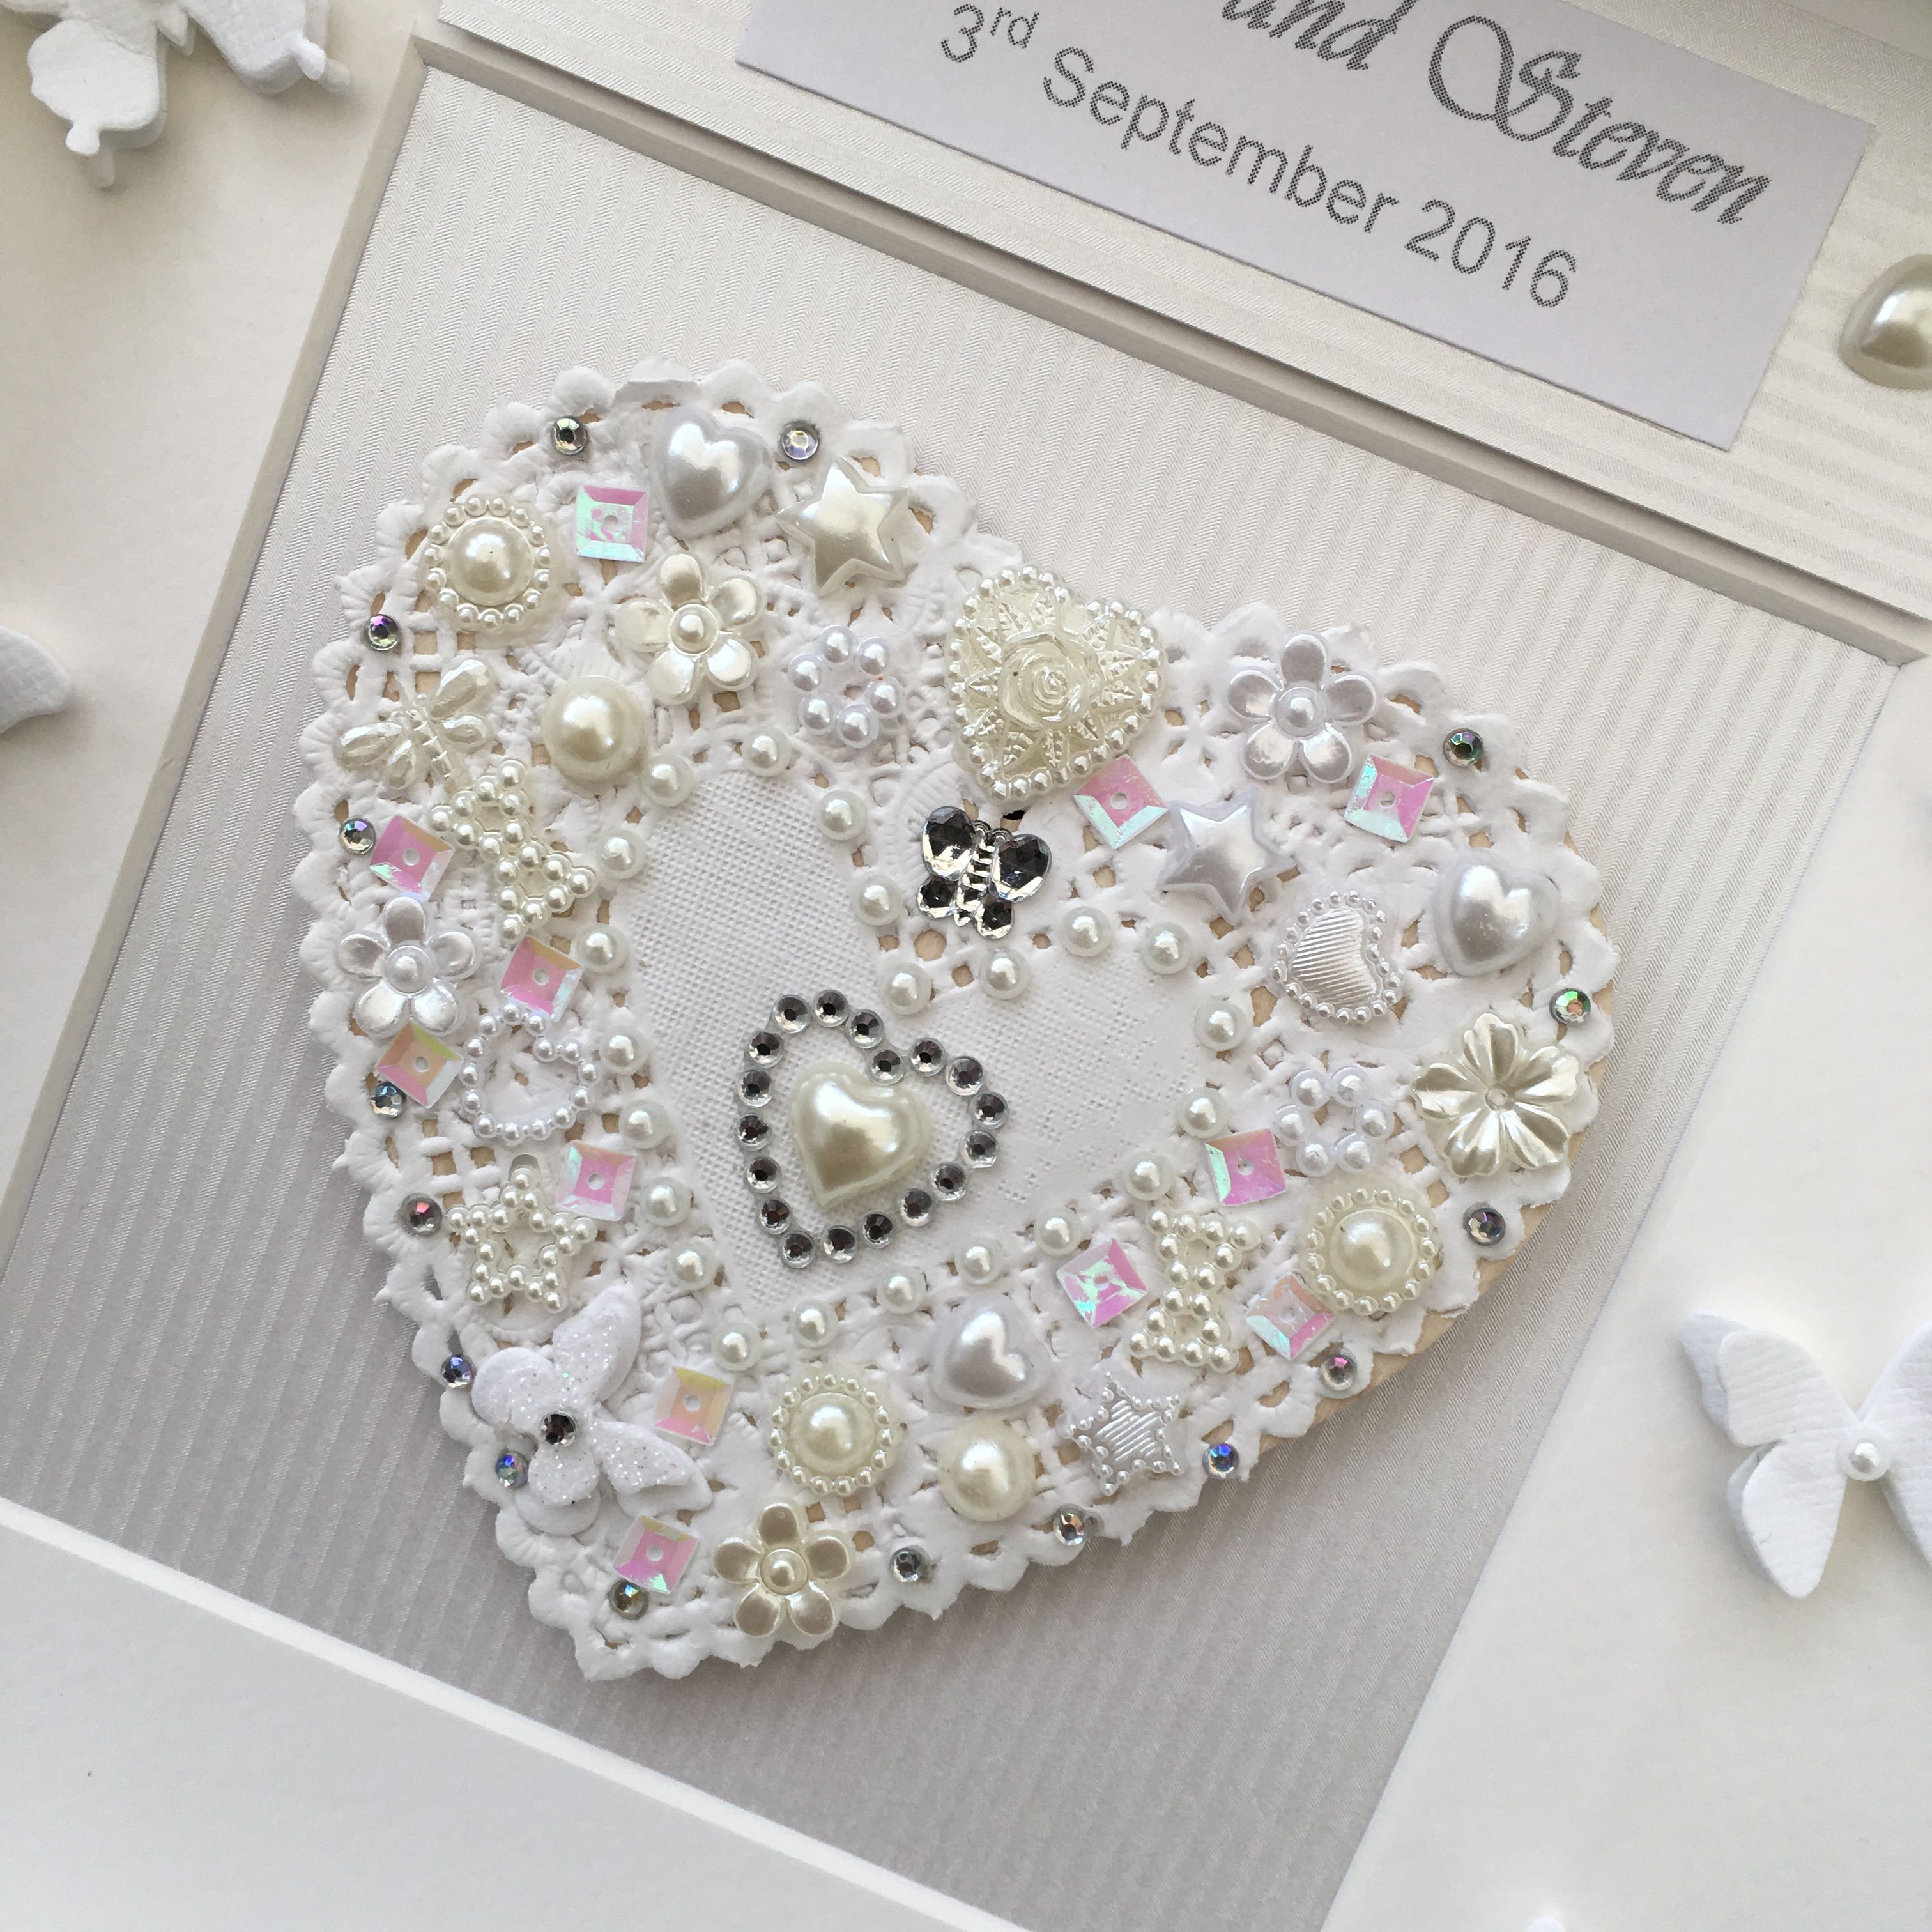 Beautiful box framed wedding or anniversary celebration